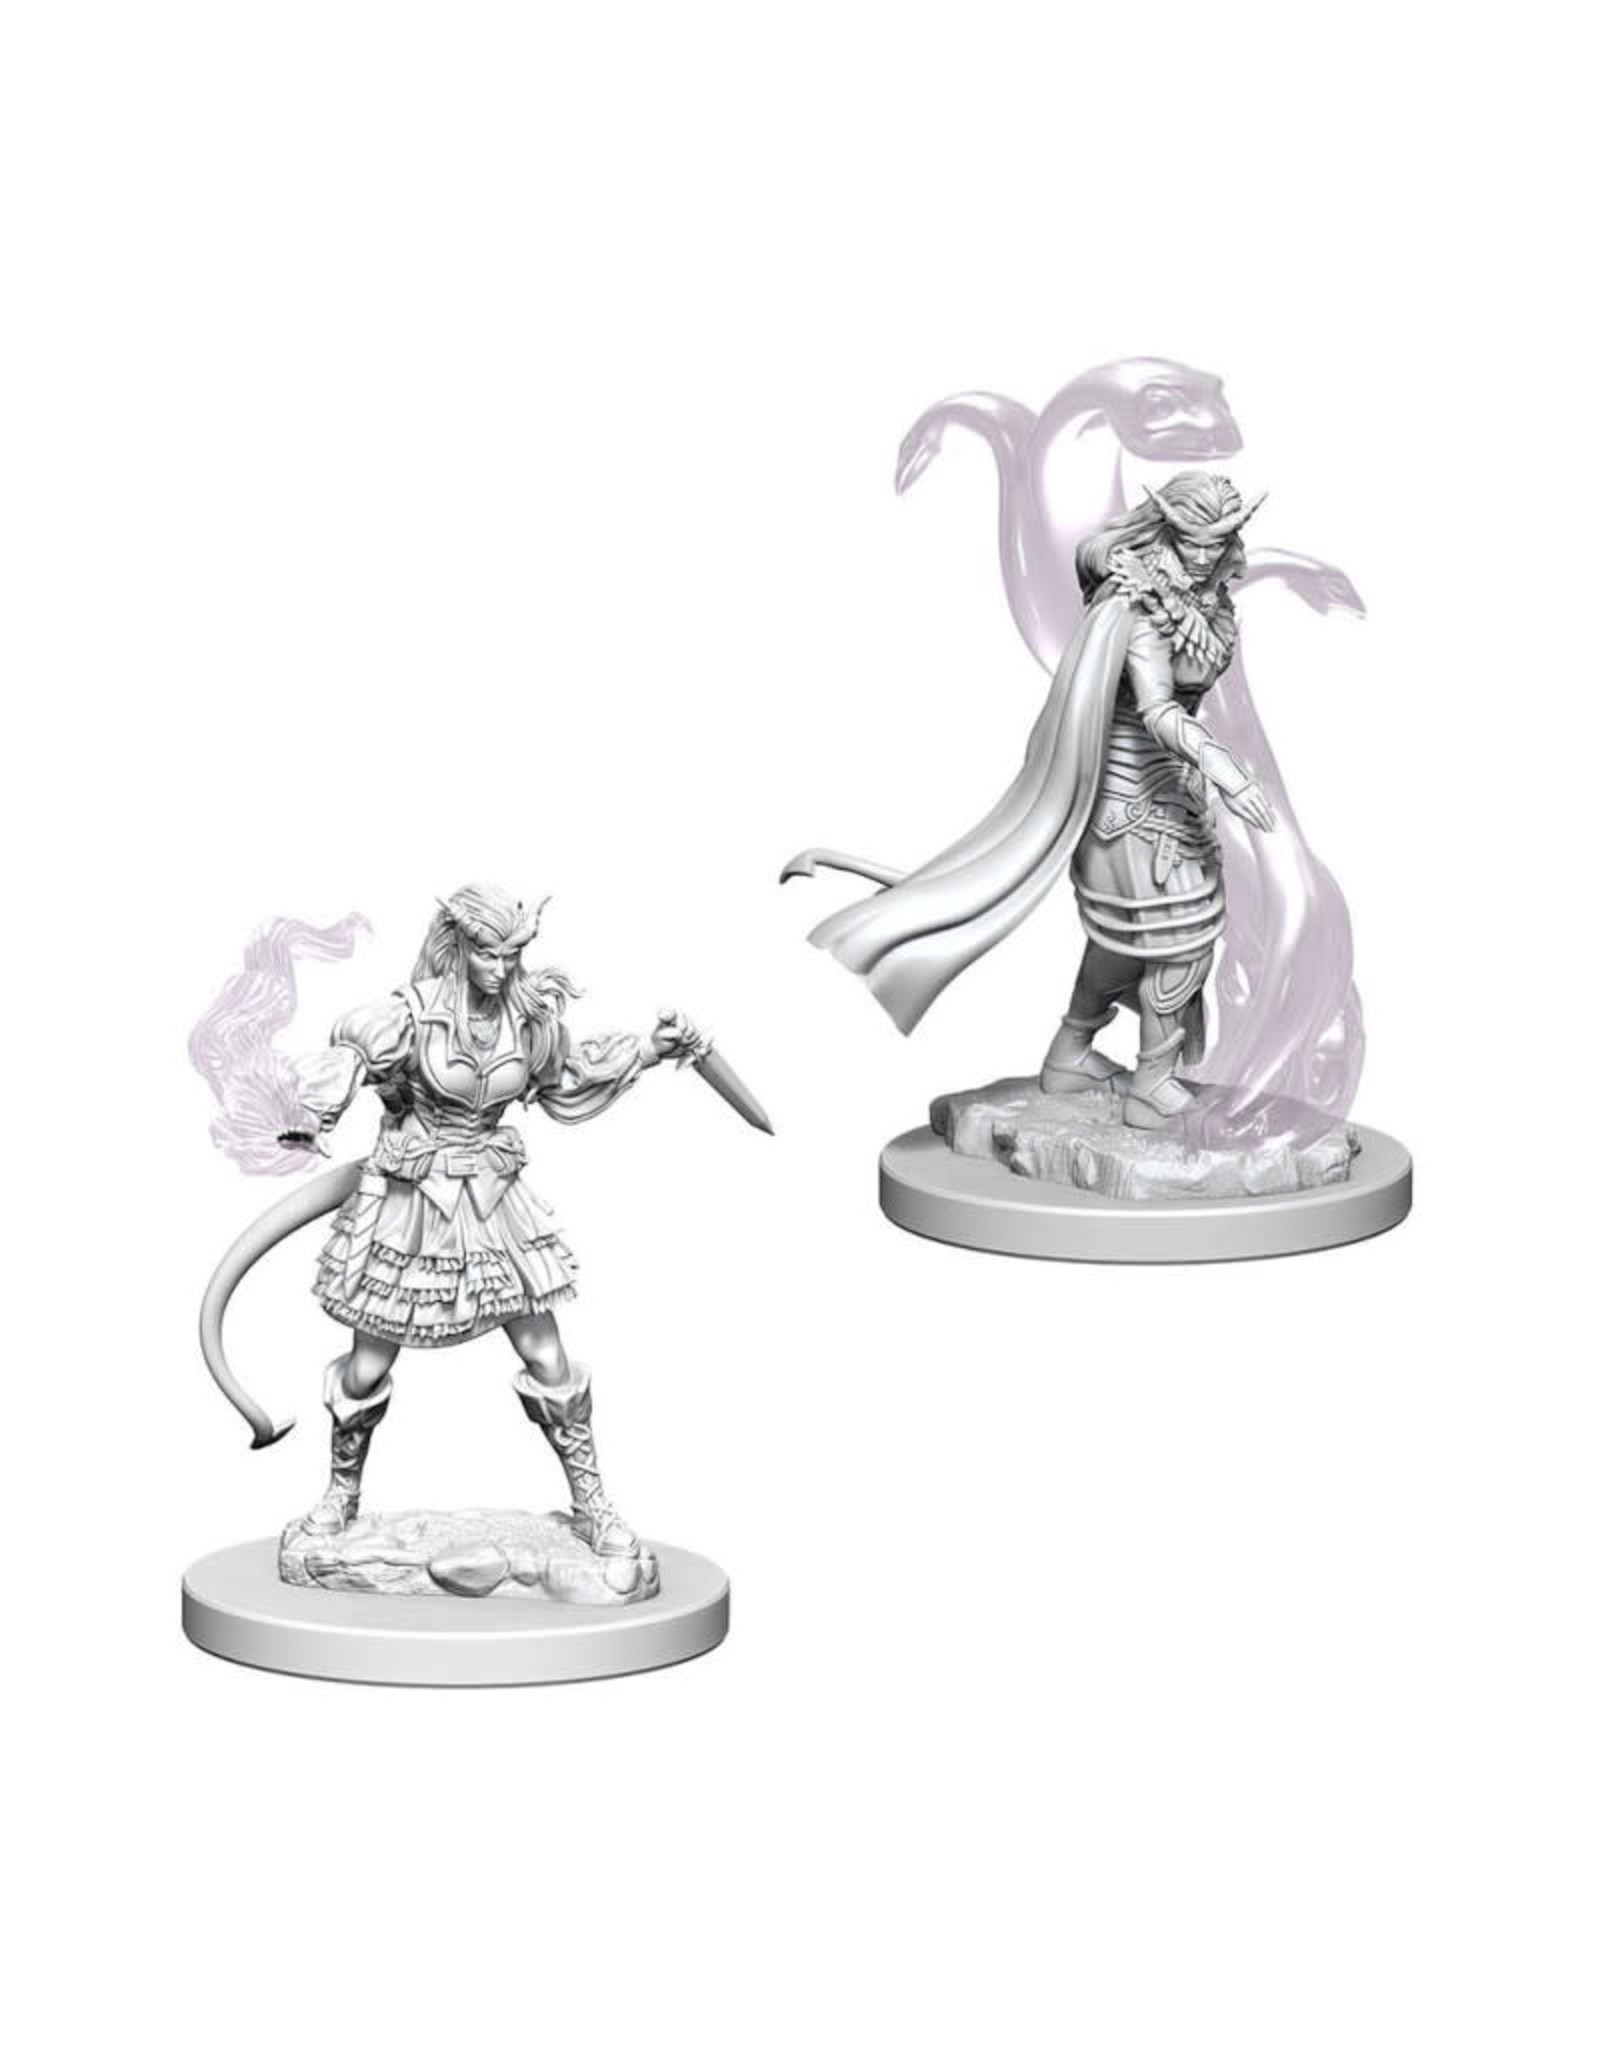 Wizkids D&D Unpainted Minis: Tiefling Sorcerer Female